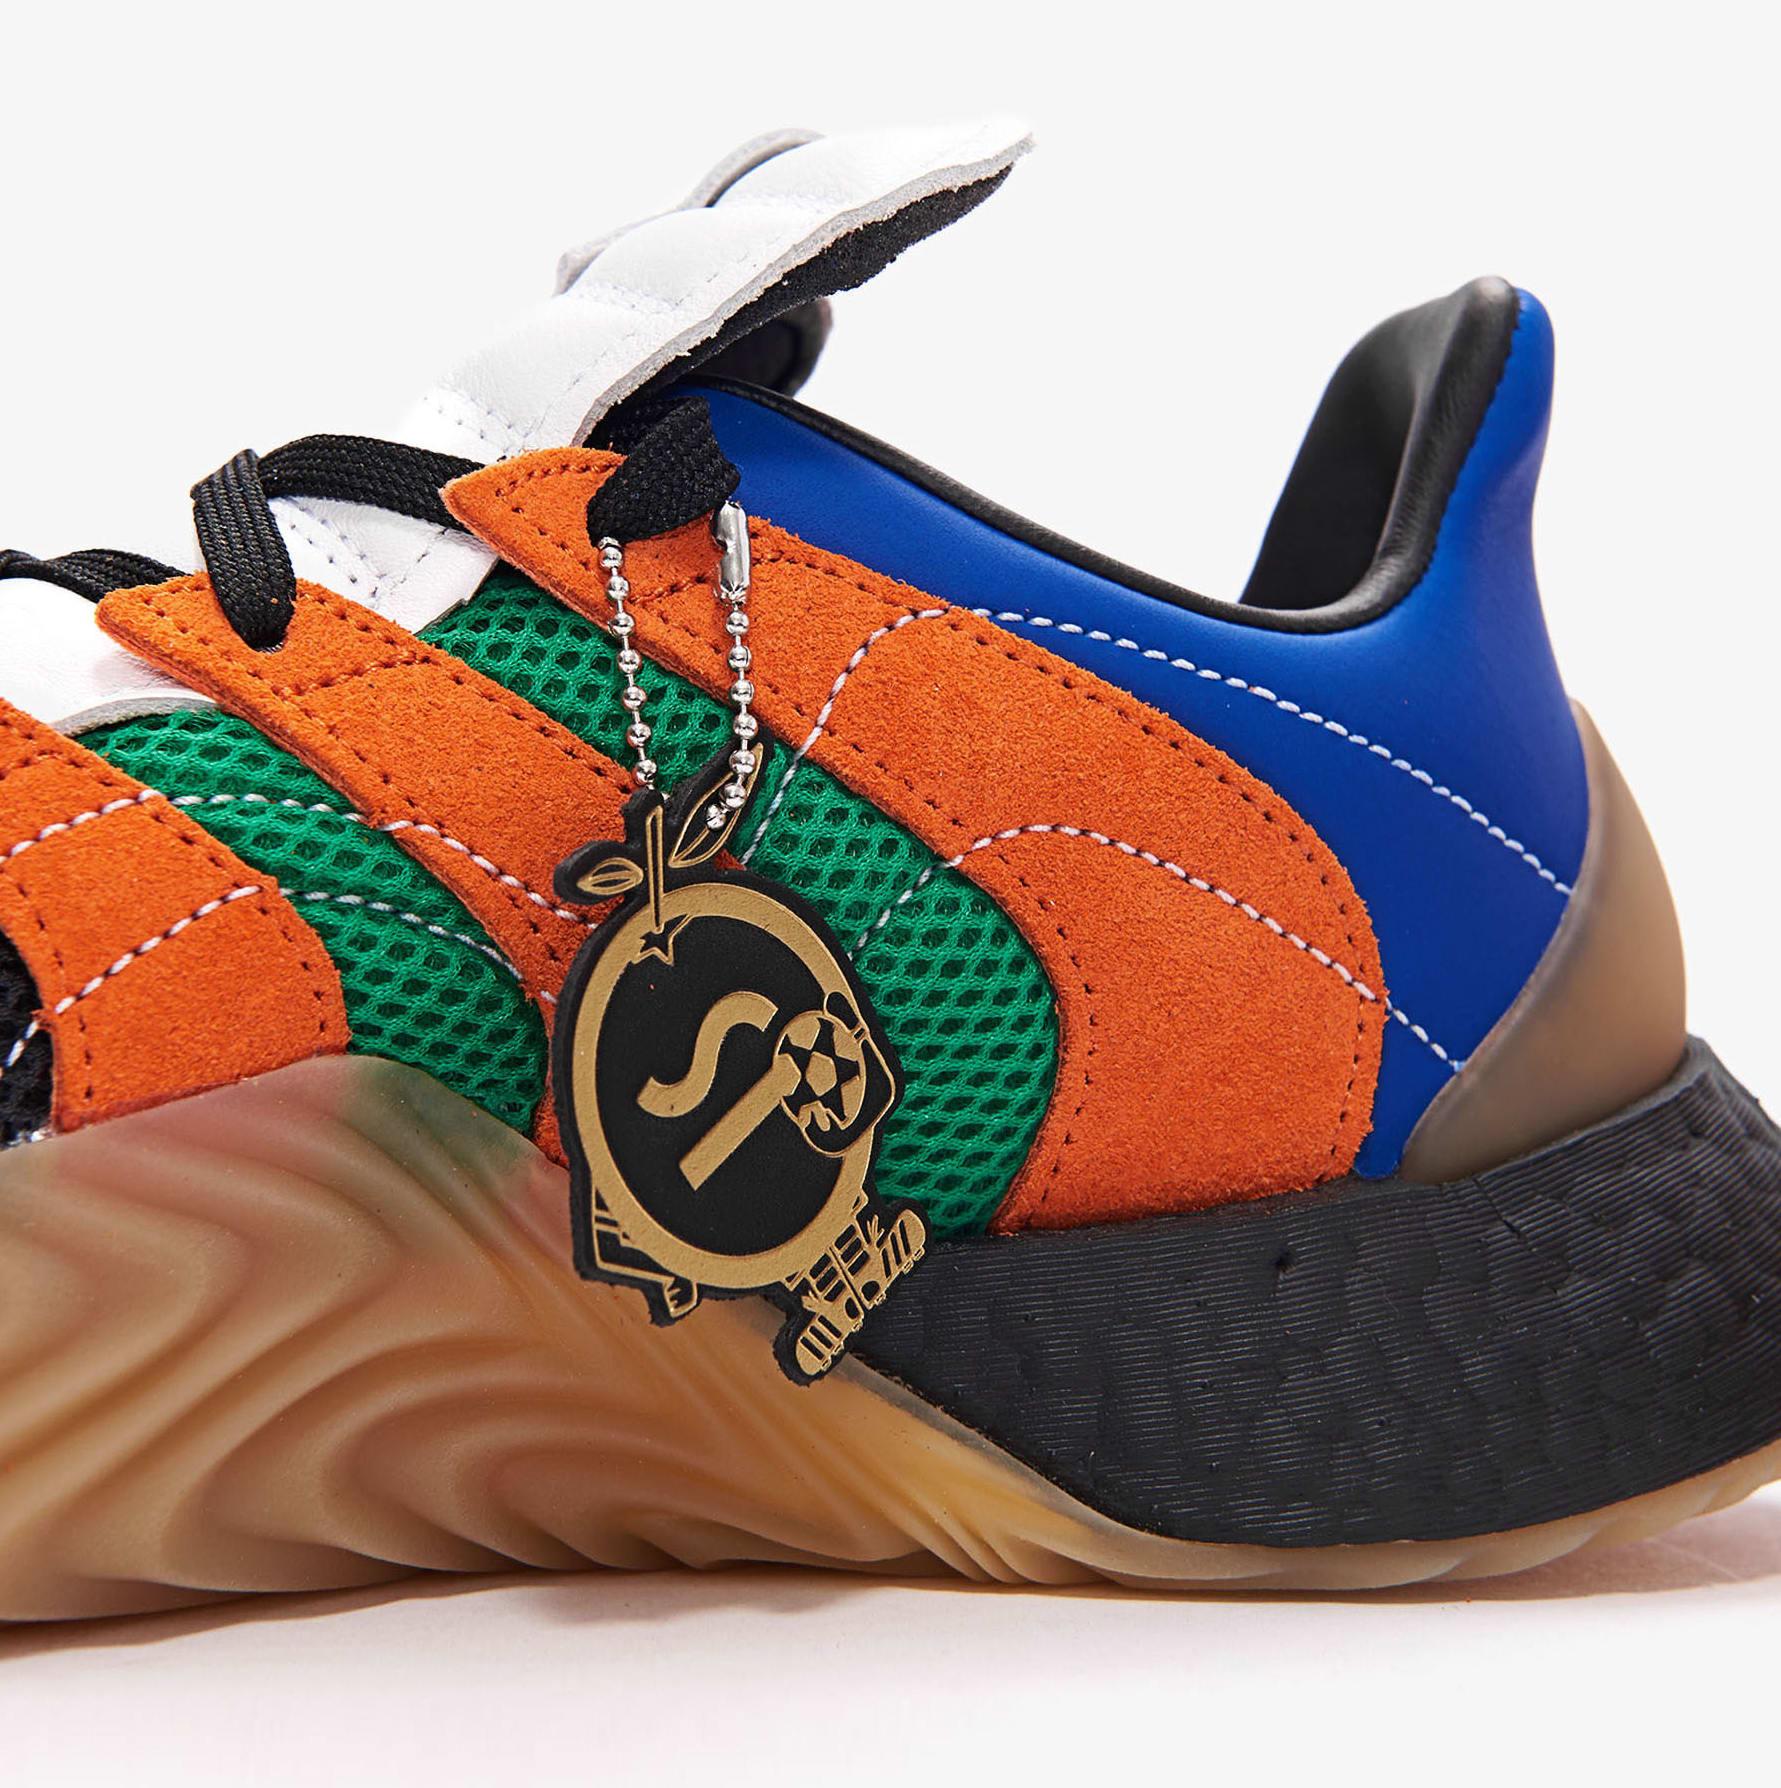 SVD x Adidas Sobakov Boost G26821 (Detail)